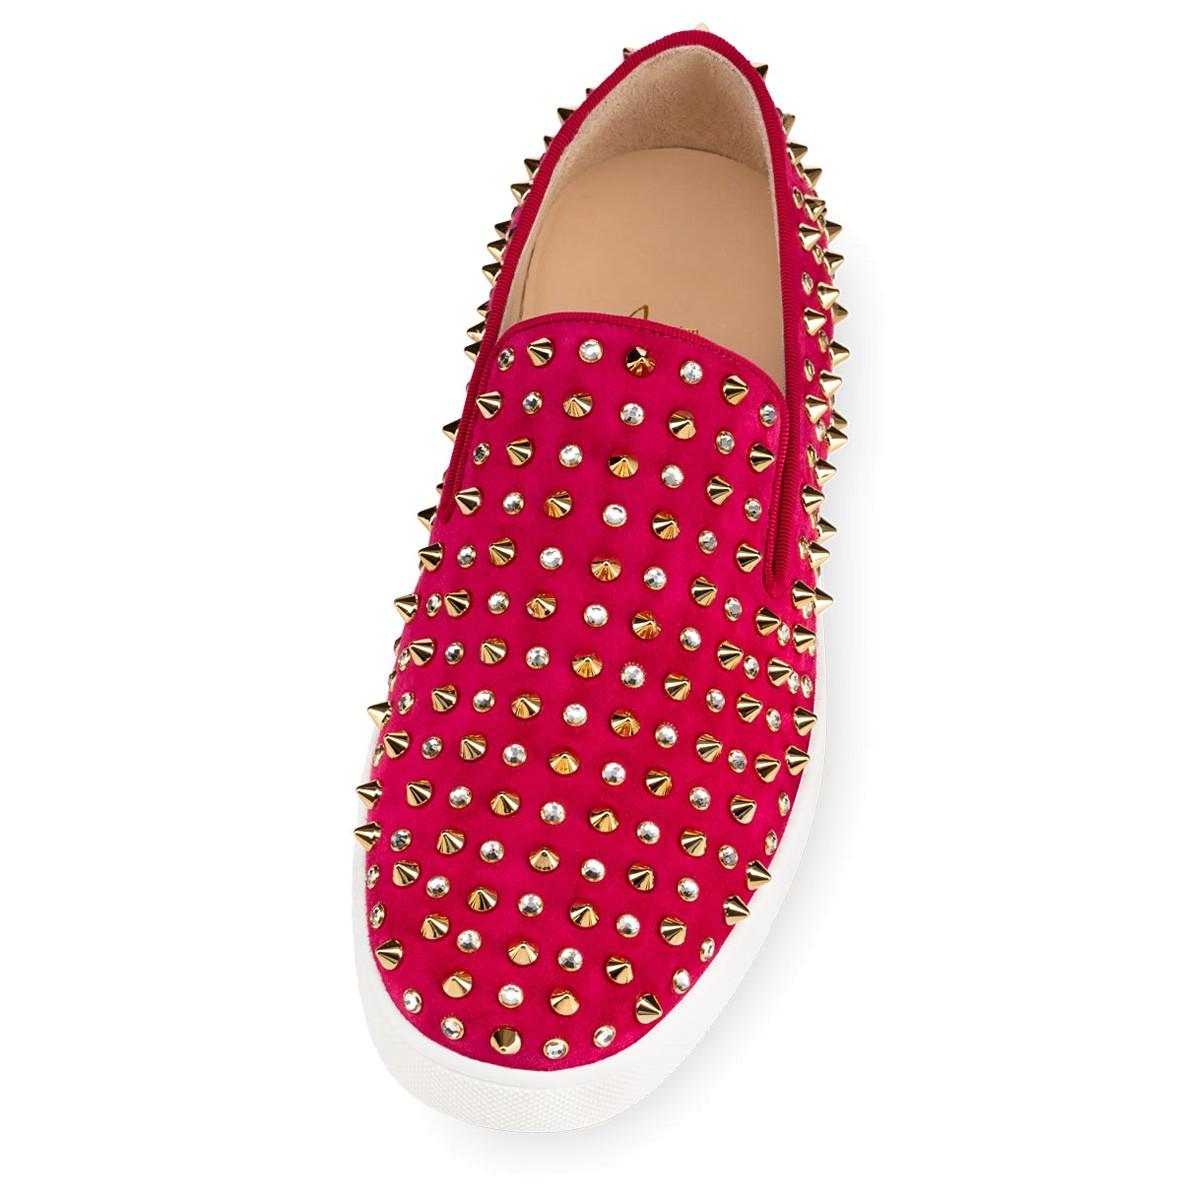 laboutin replica - Christian louboutin Roller 1c1s Woman\u0026#39;s Flat in Pink (Fushia/Gold ...